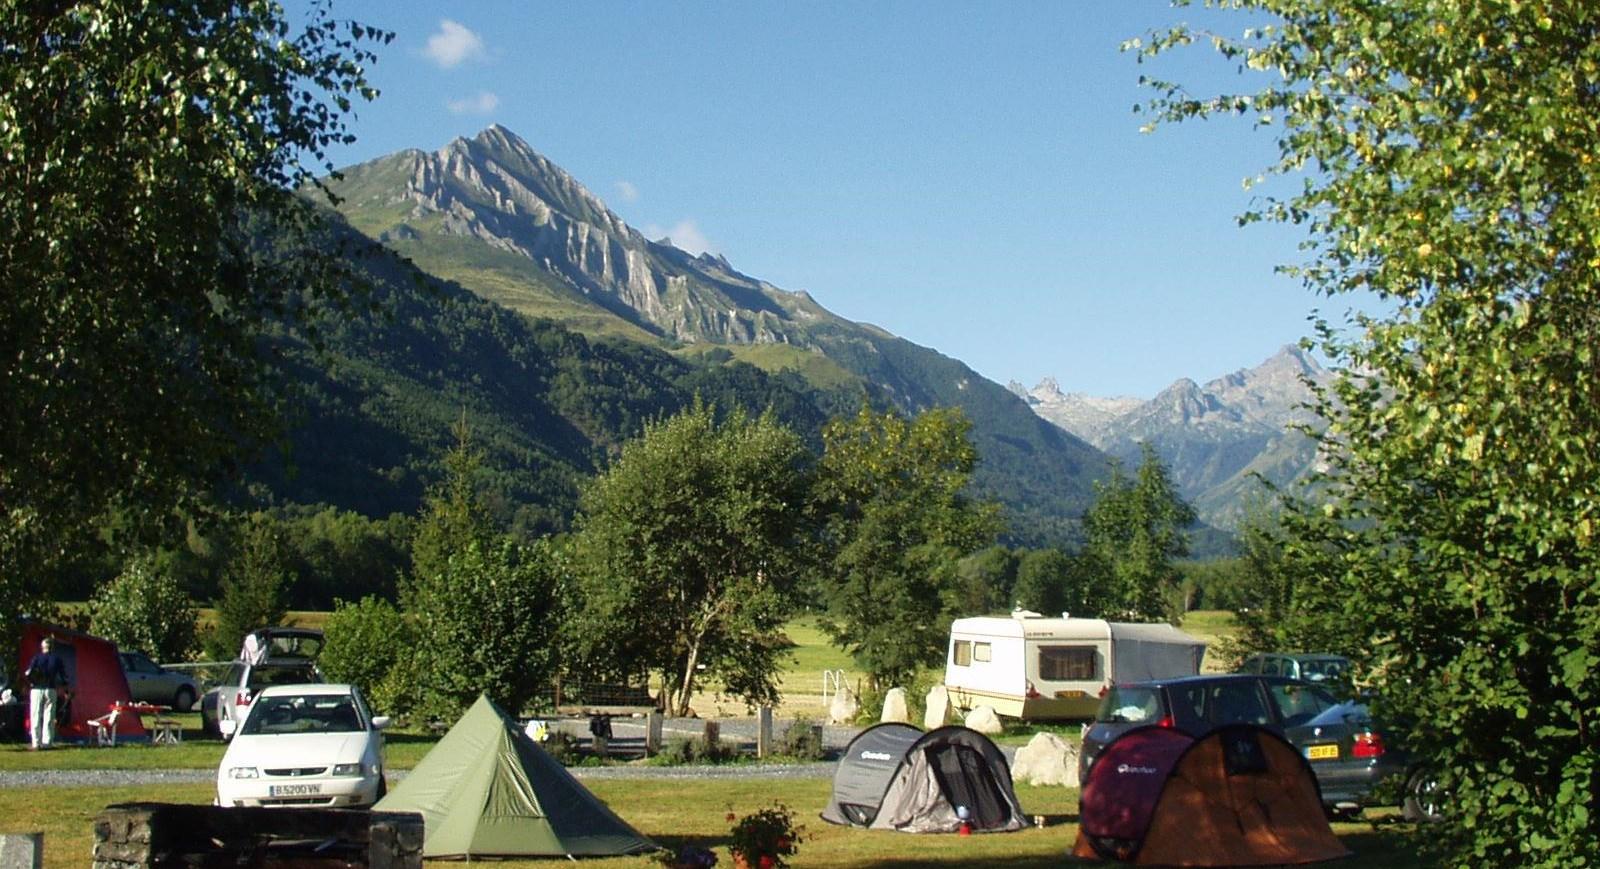 camping en los pirineos franceses - camping direct